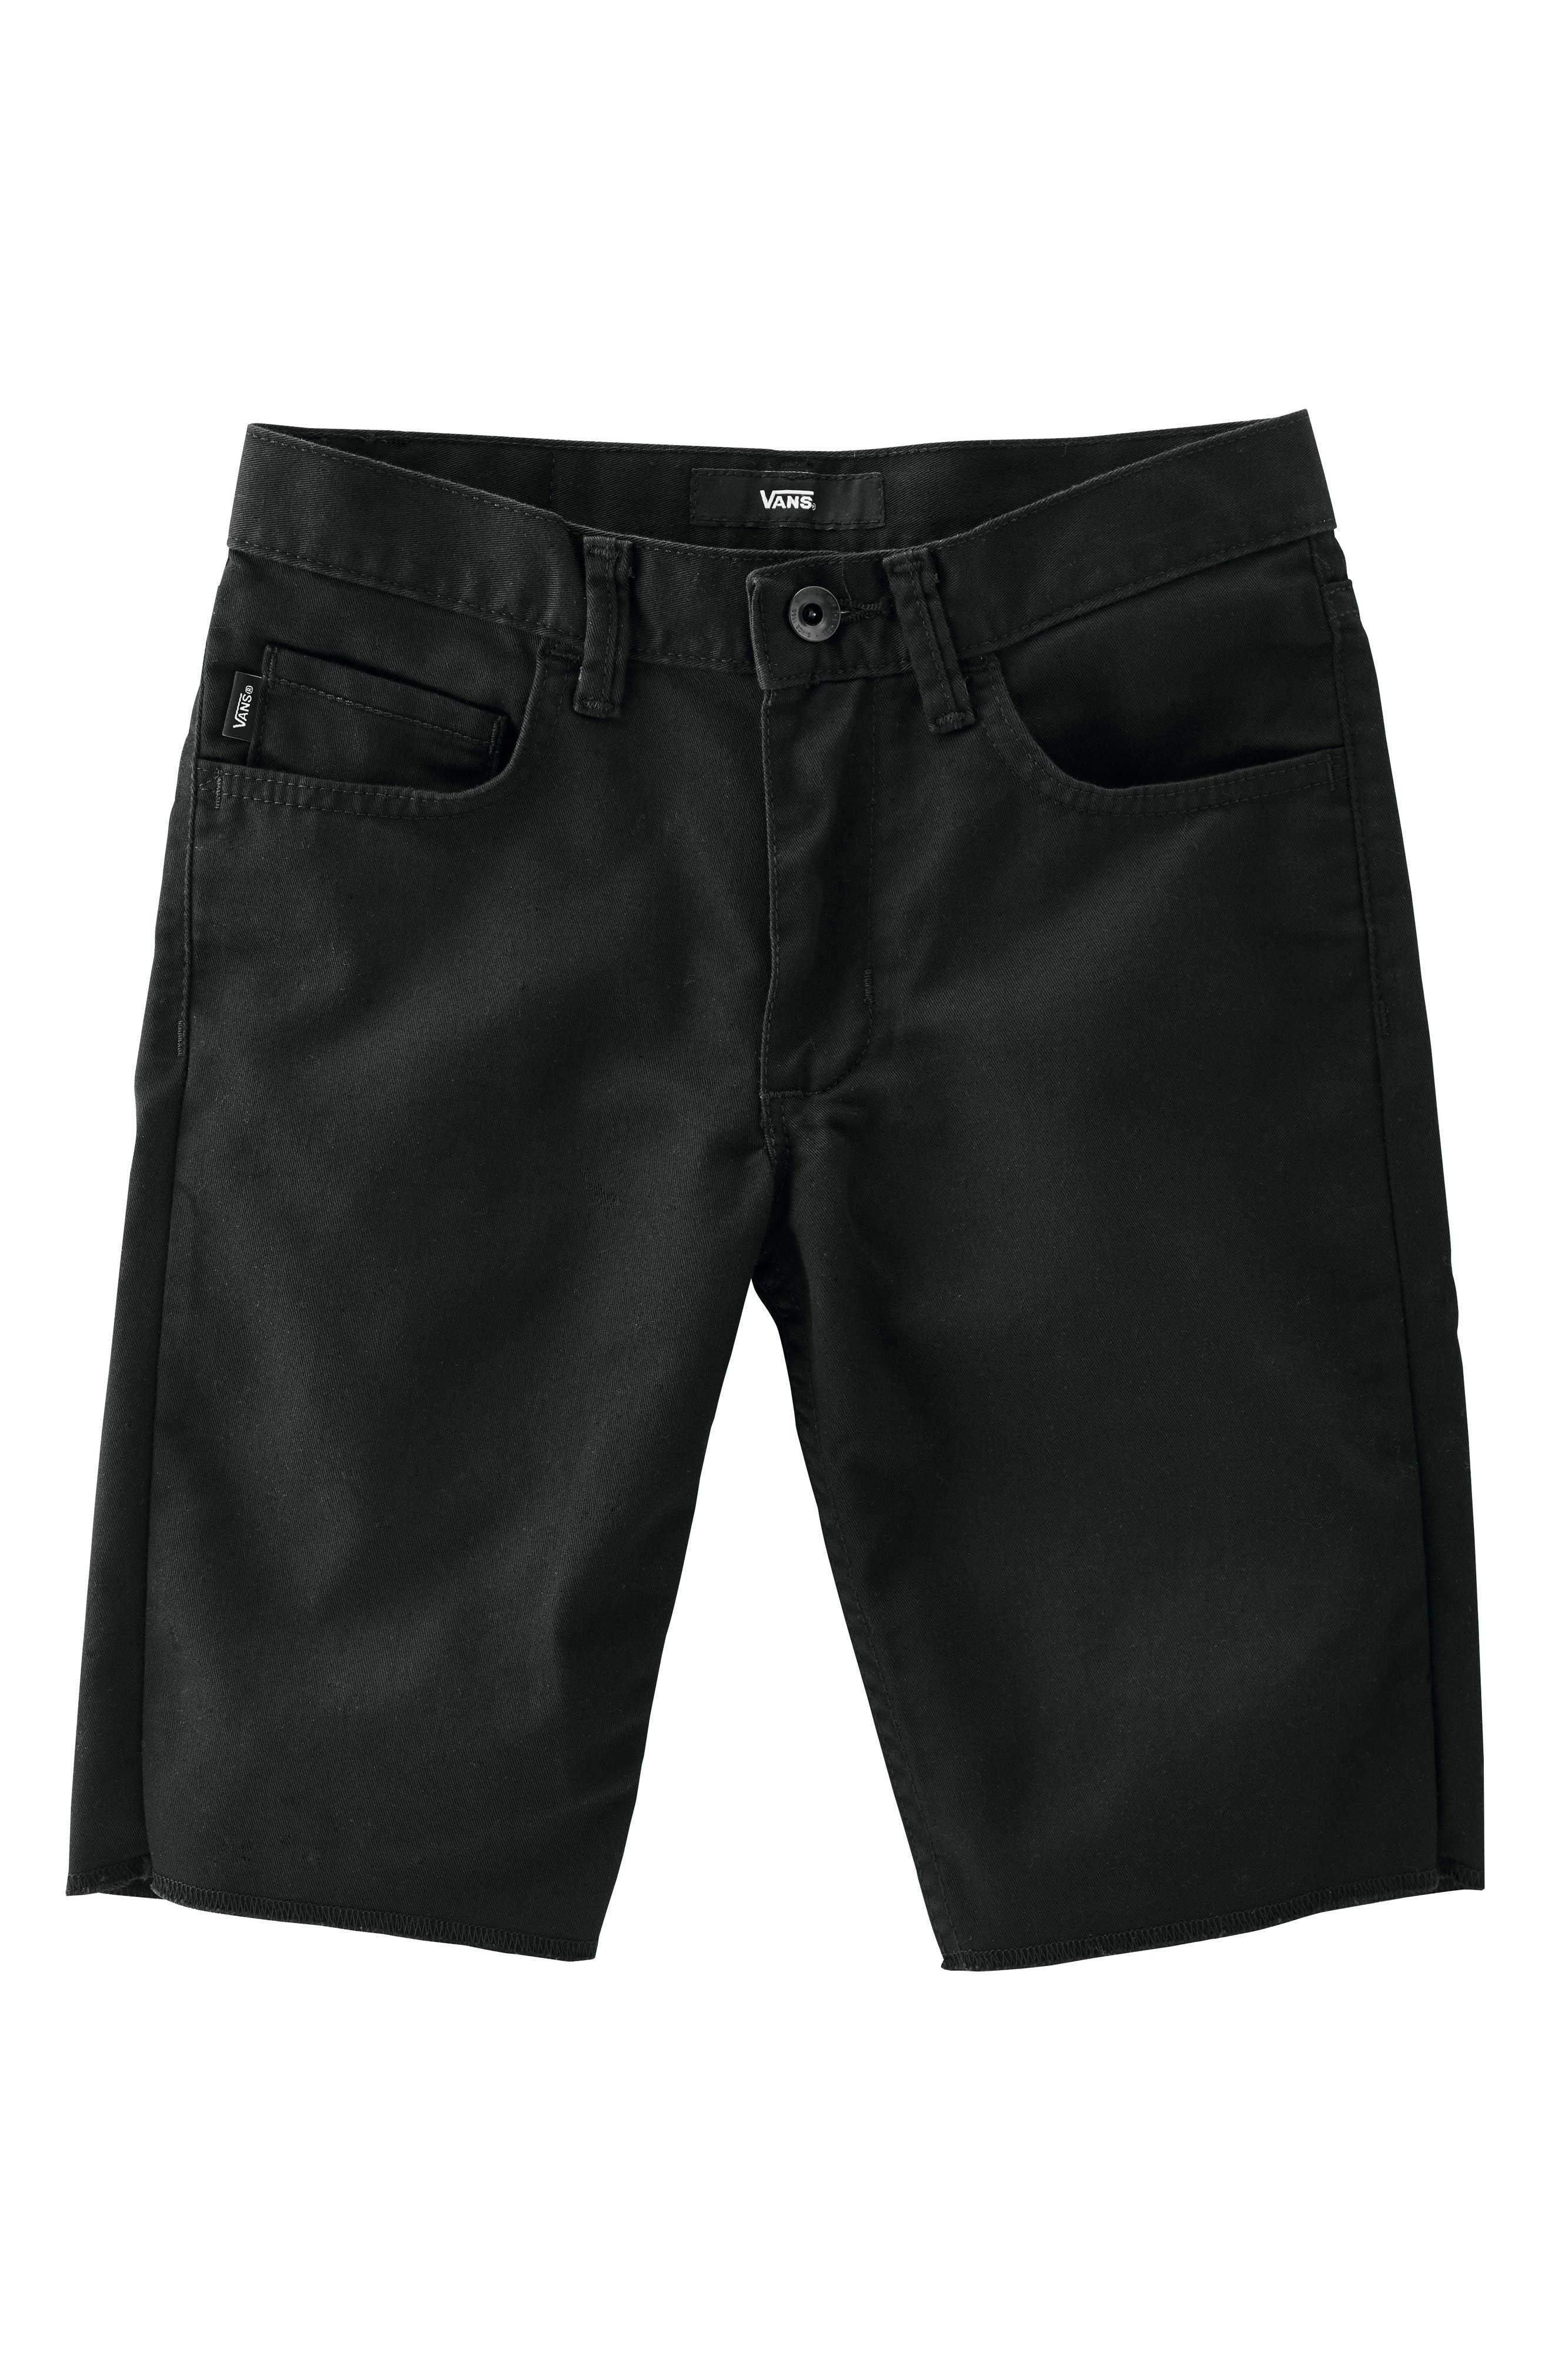 Covina II - Anthony Van Engelen Twill Shorts,                             Main thumbnail 1, color,                             001